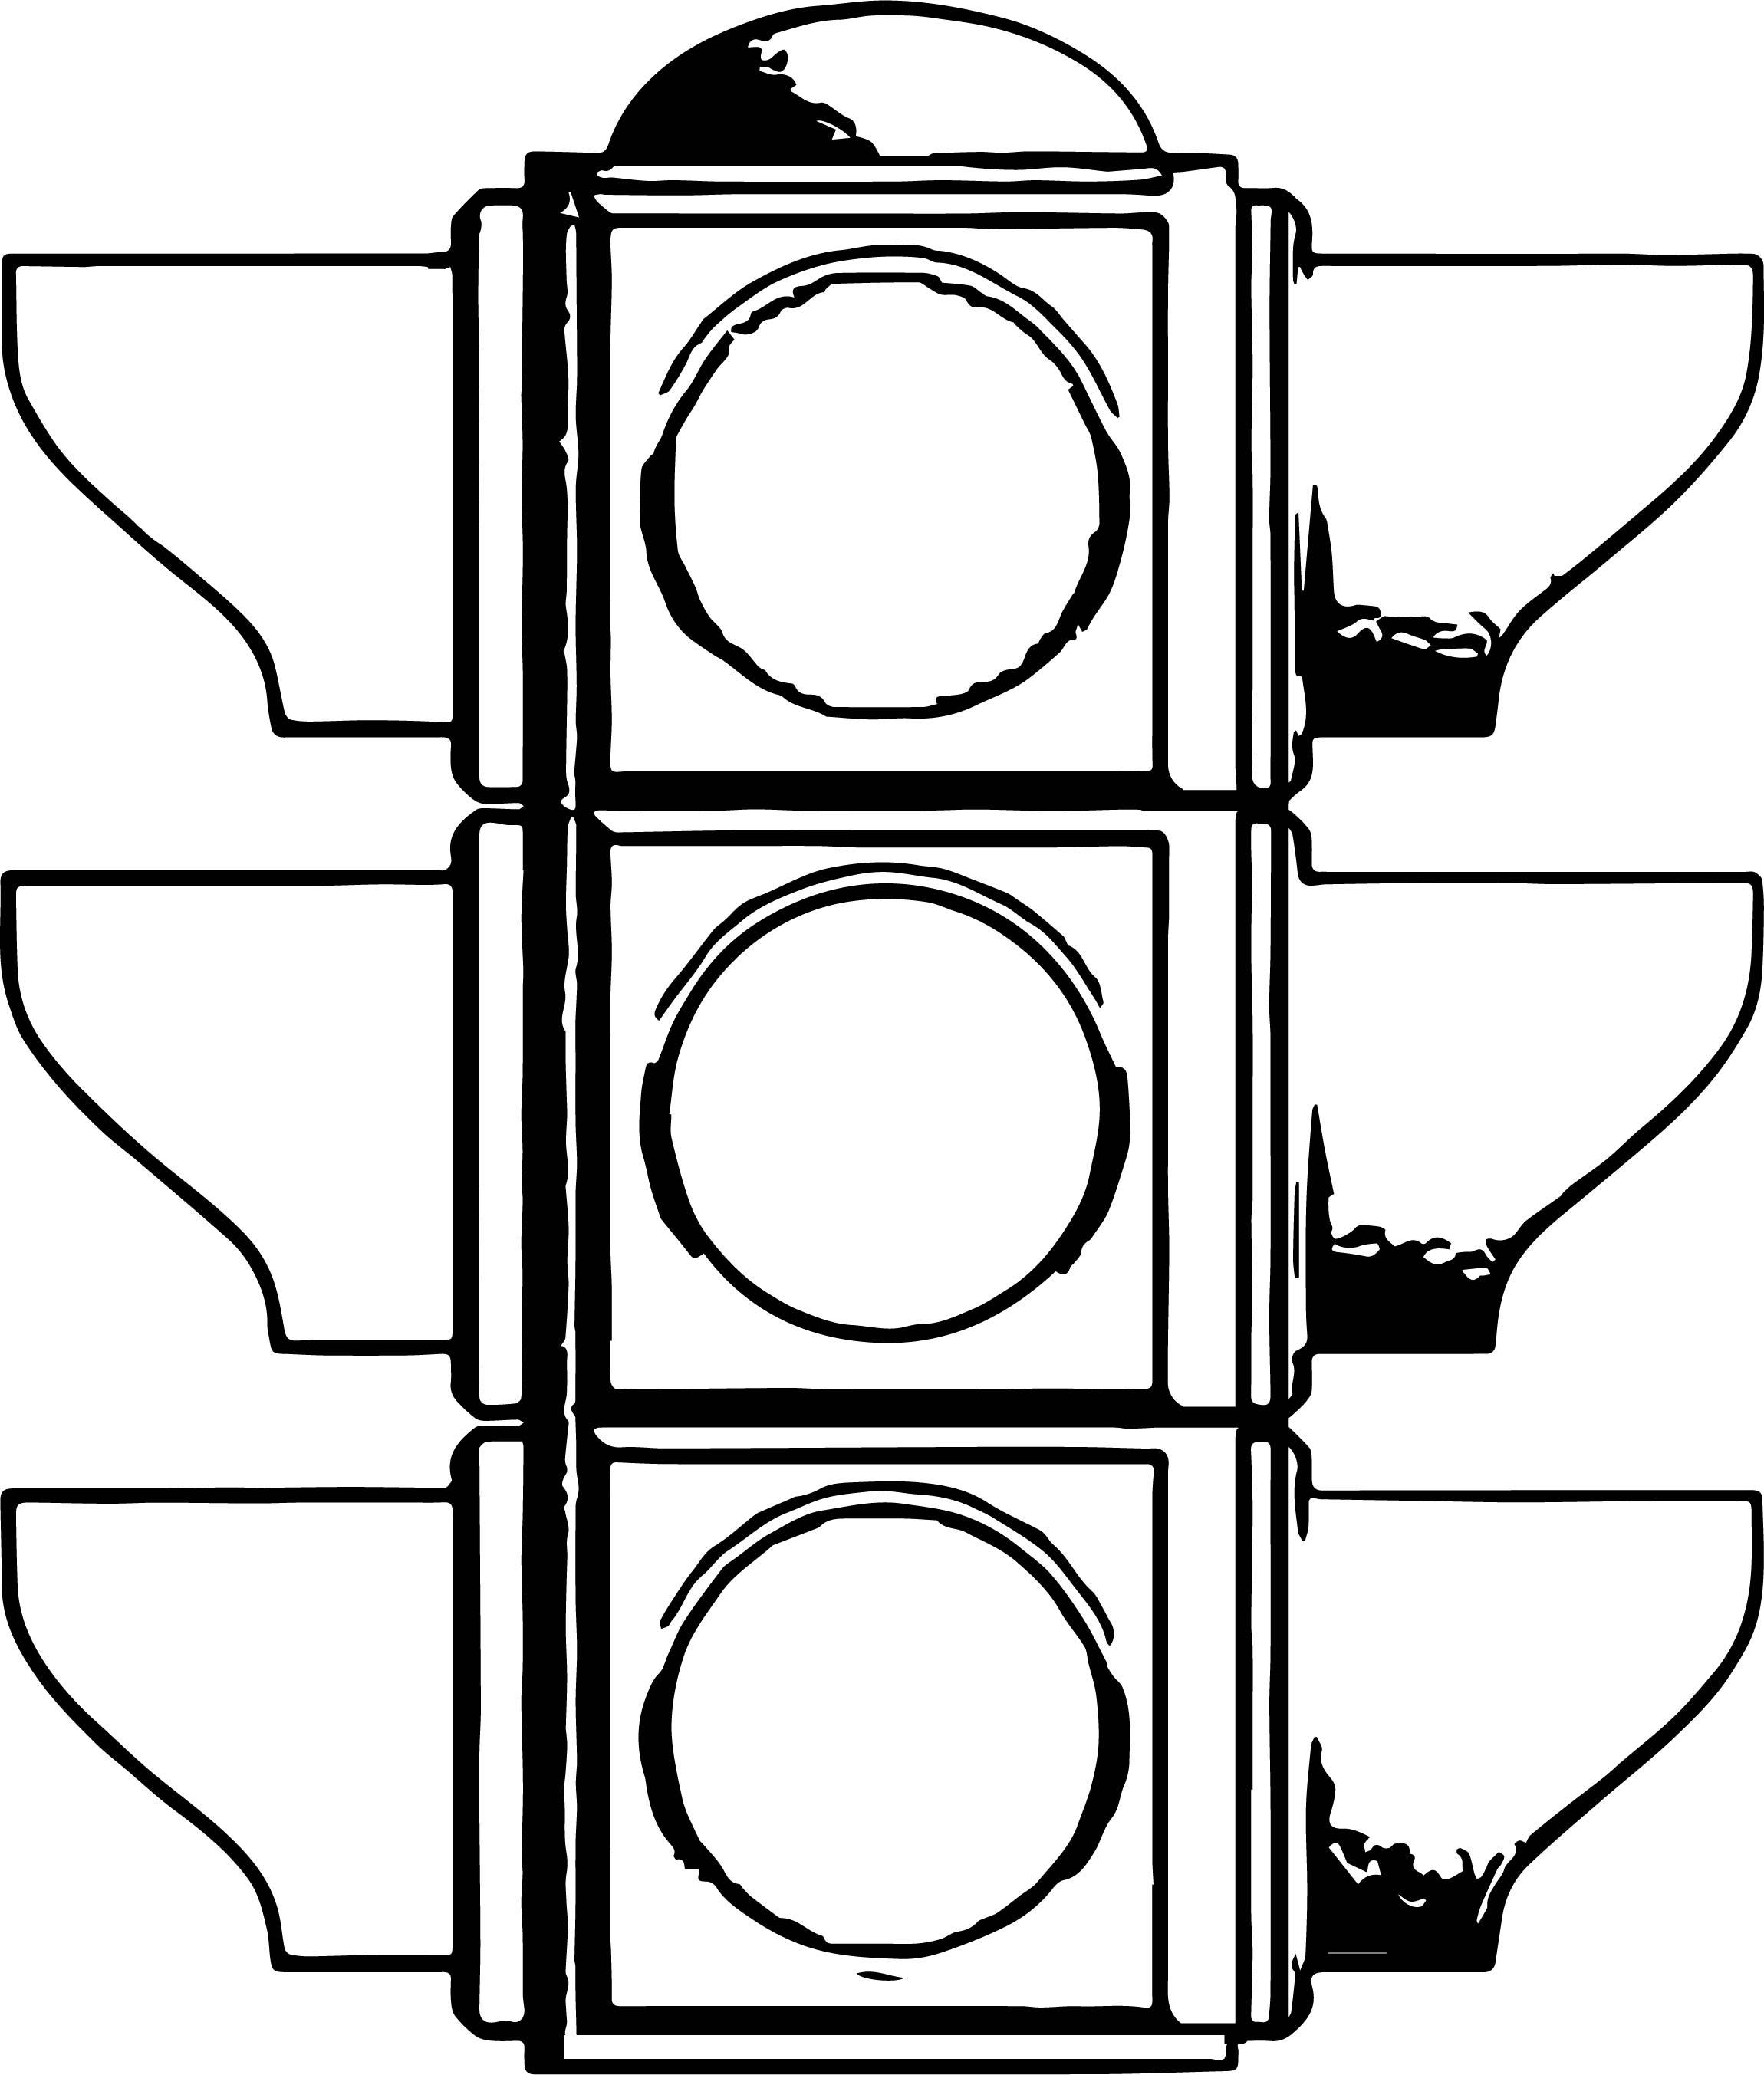 Traffic Signal Drawing | Free download best Traffic Signal ...